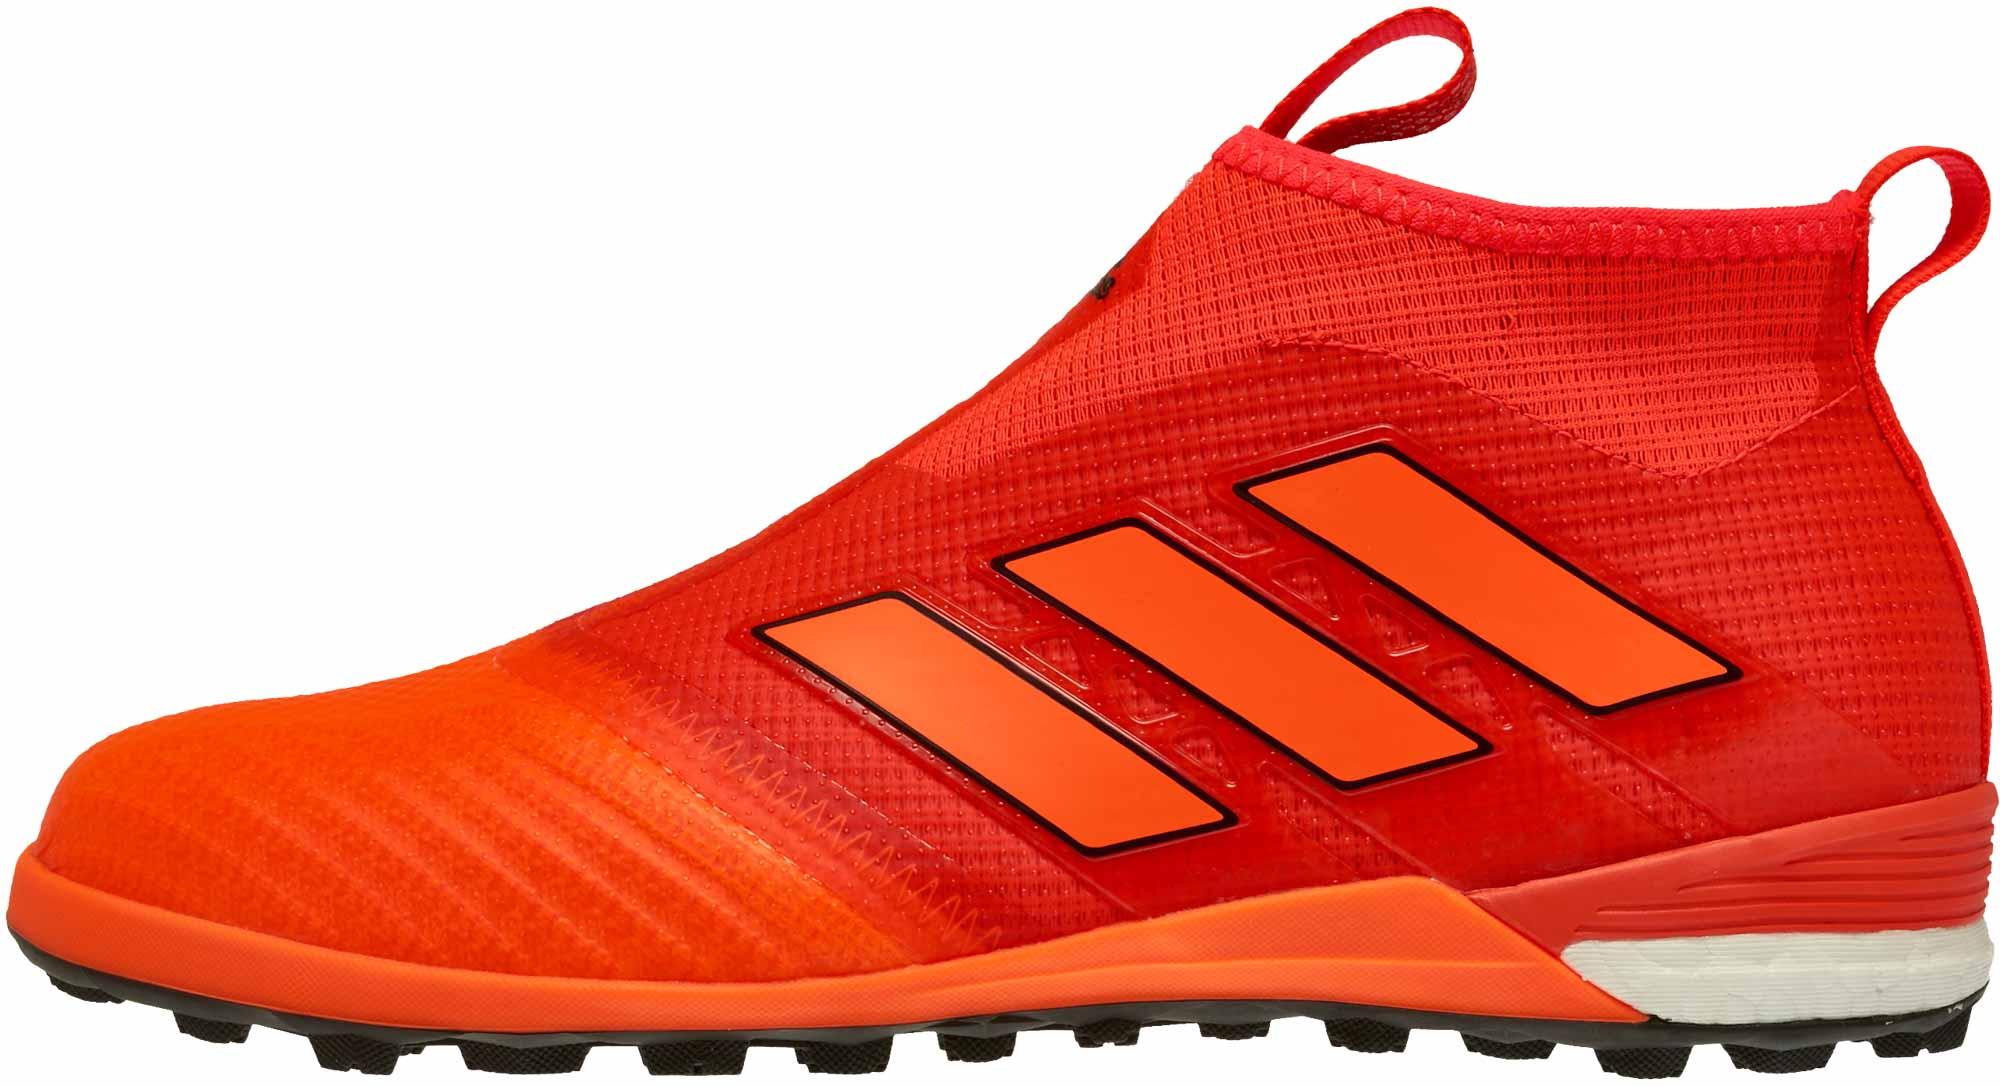 Bigote Gorrión fregar  adidas ACE Tango 17+ Purecontrol TF - Solar Red & Solar Orange - Soccer  Master